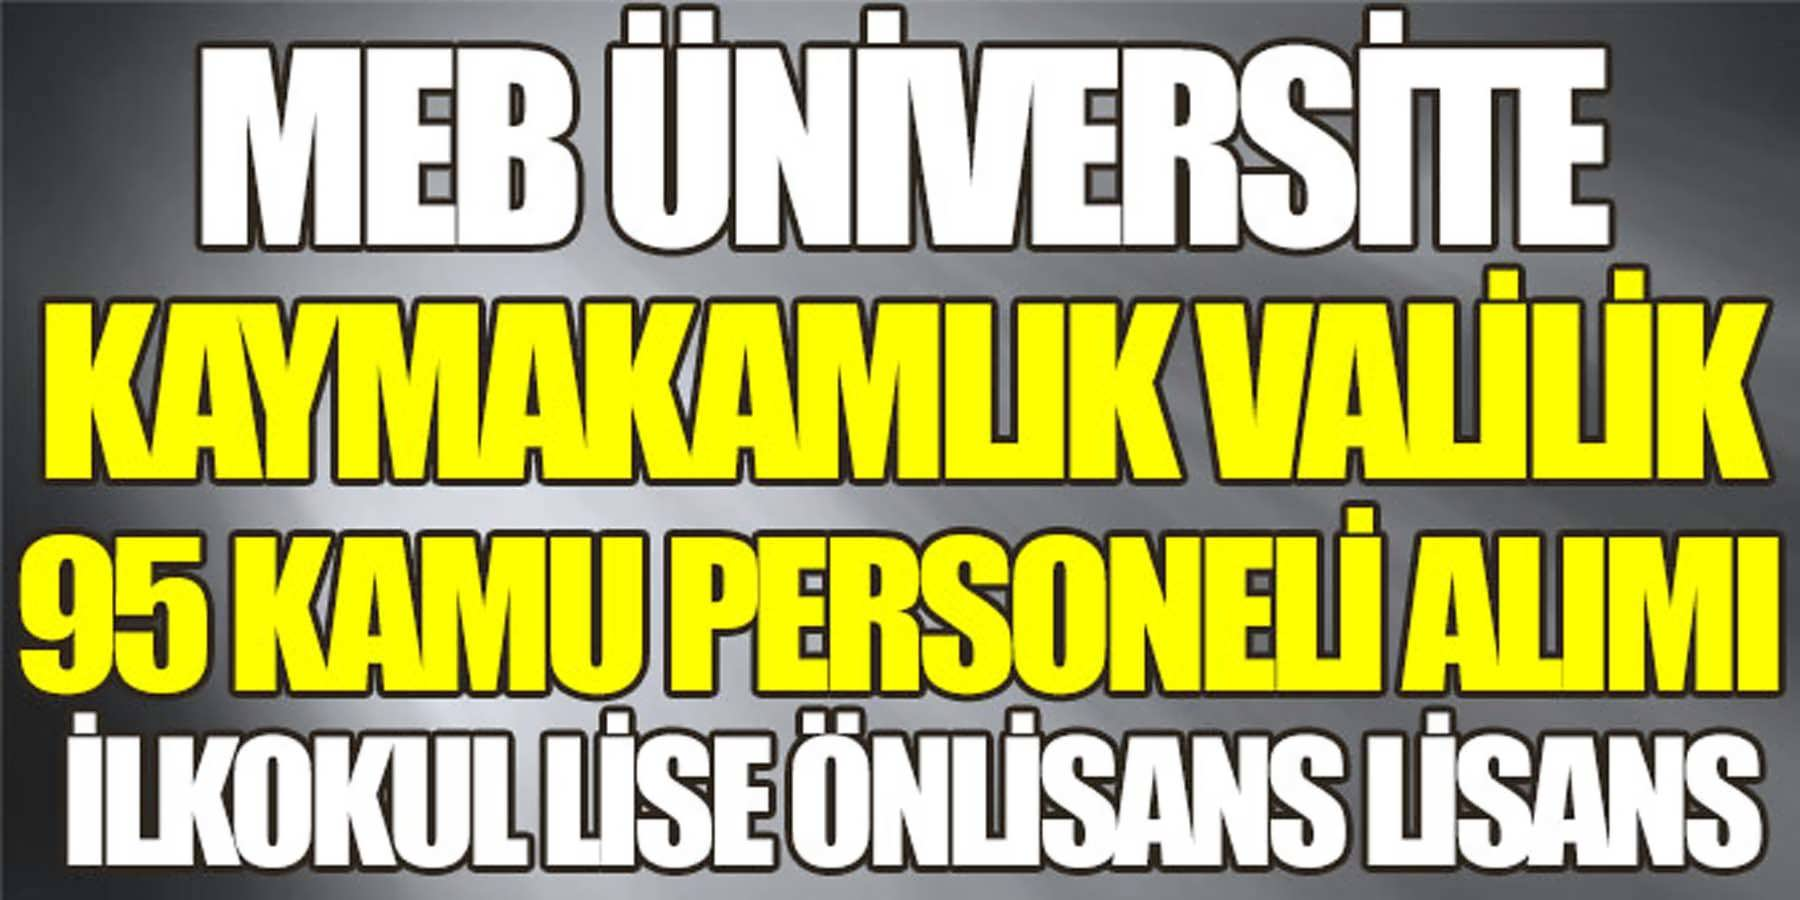 MEB, Valilik, Kaymakamlık ve Üniversite 95 Kamu Personeli Alımı